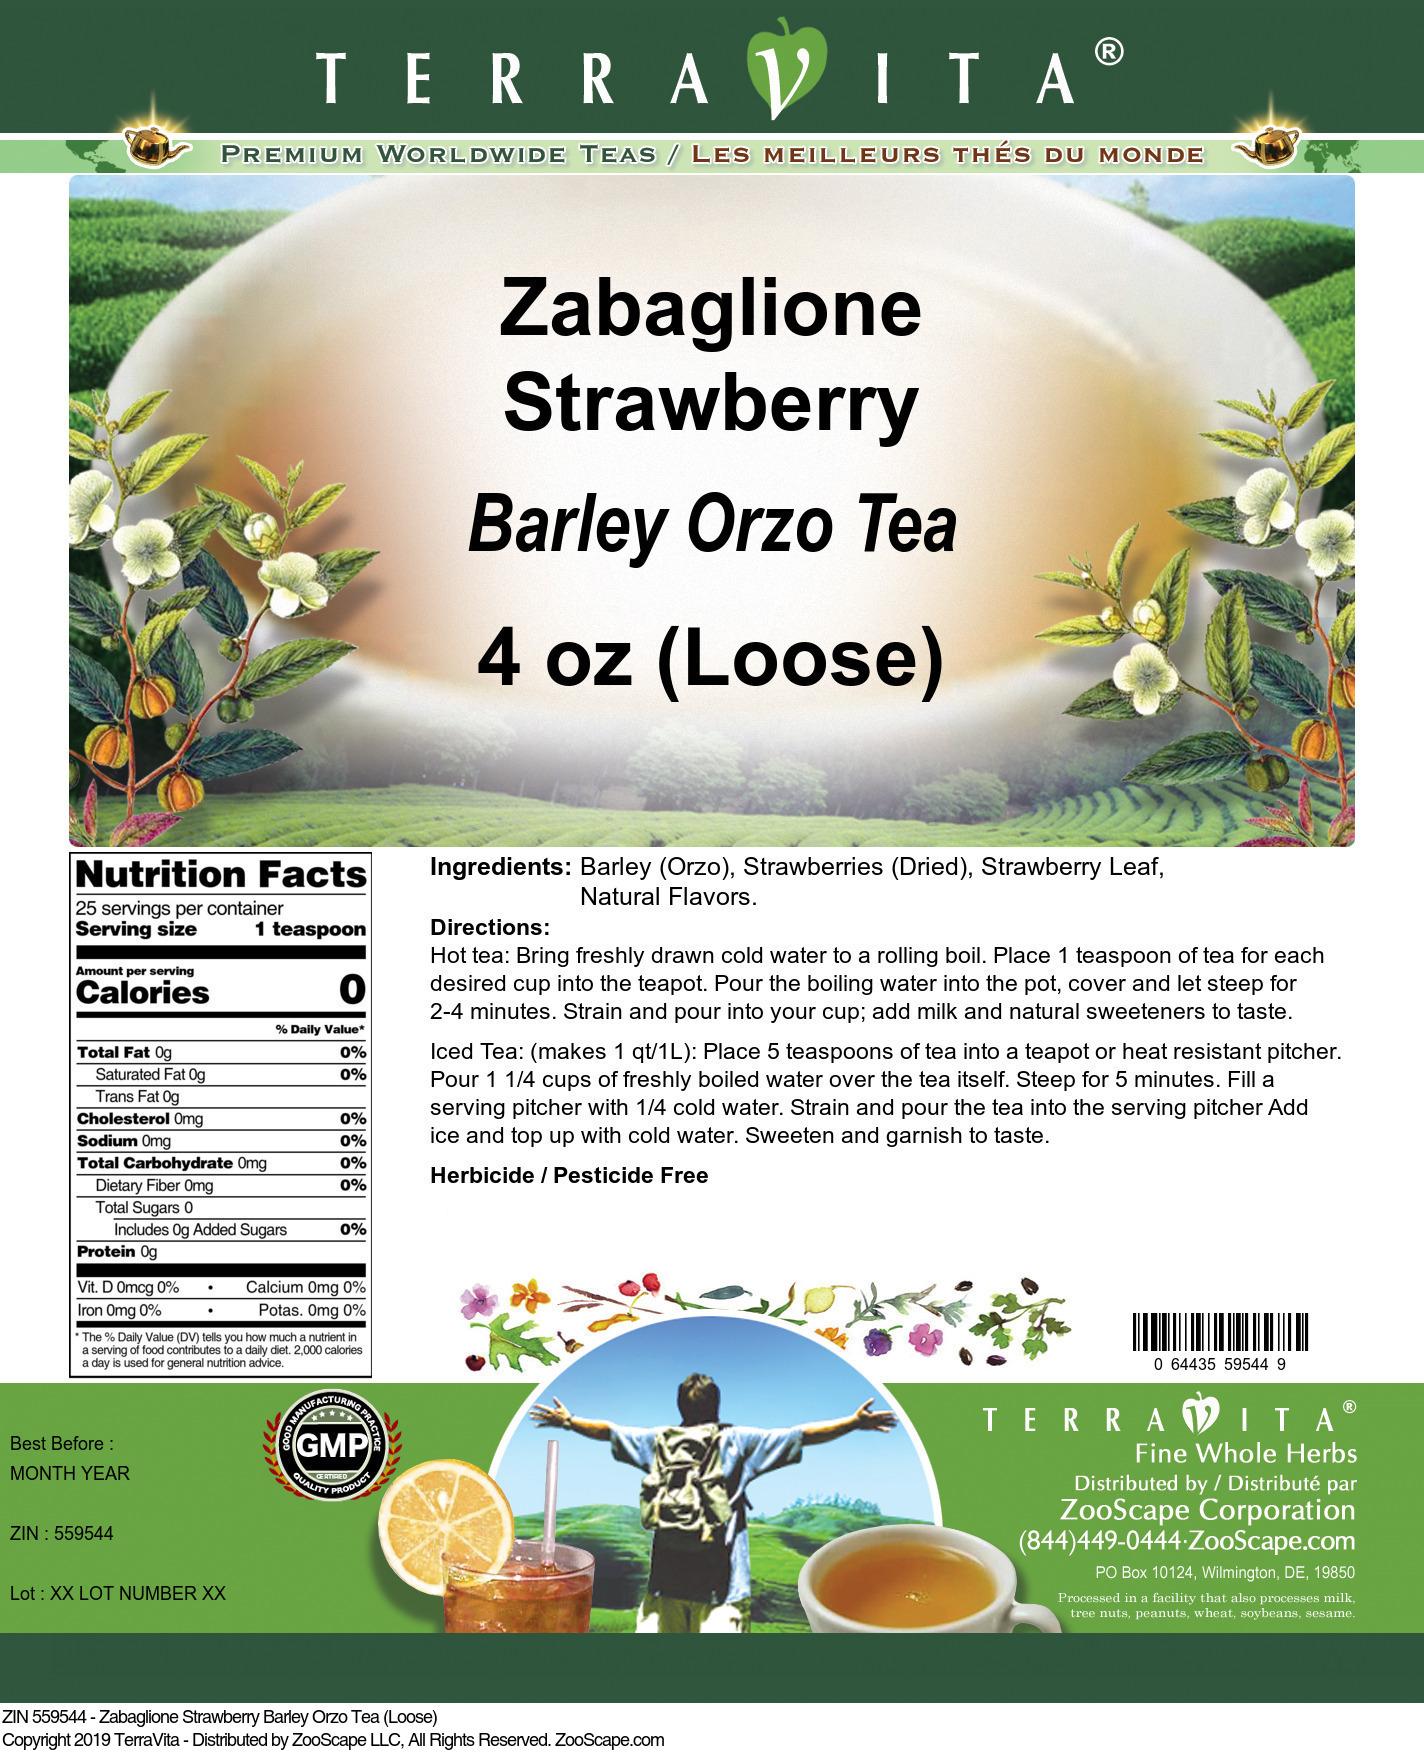 Zabaglione Strawberry Barley Orzo